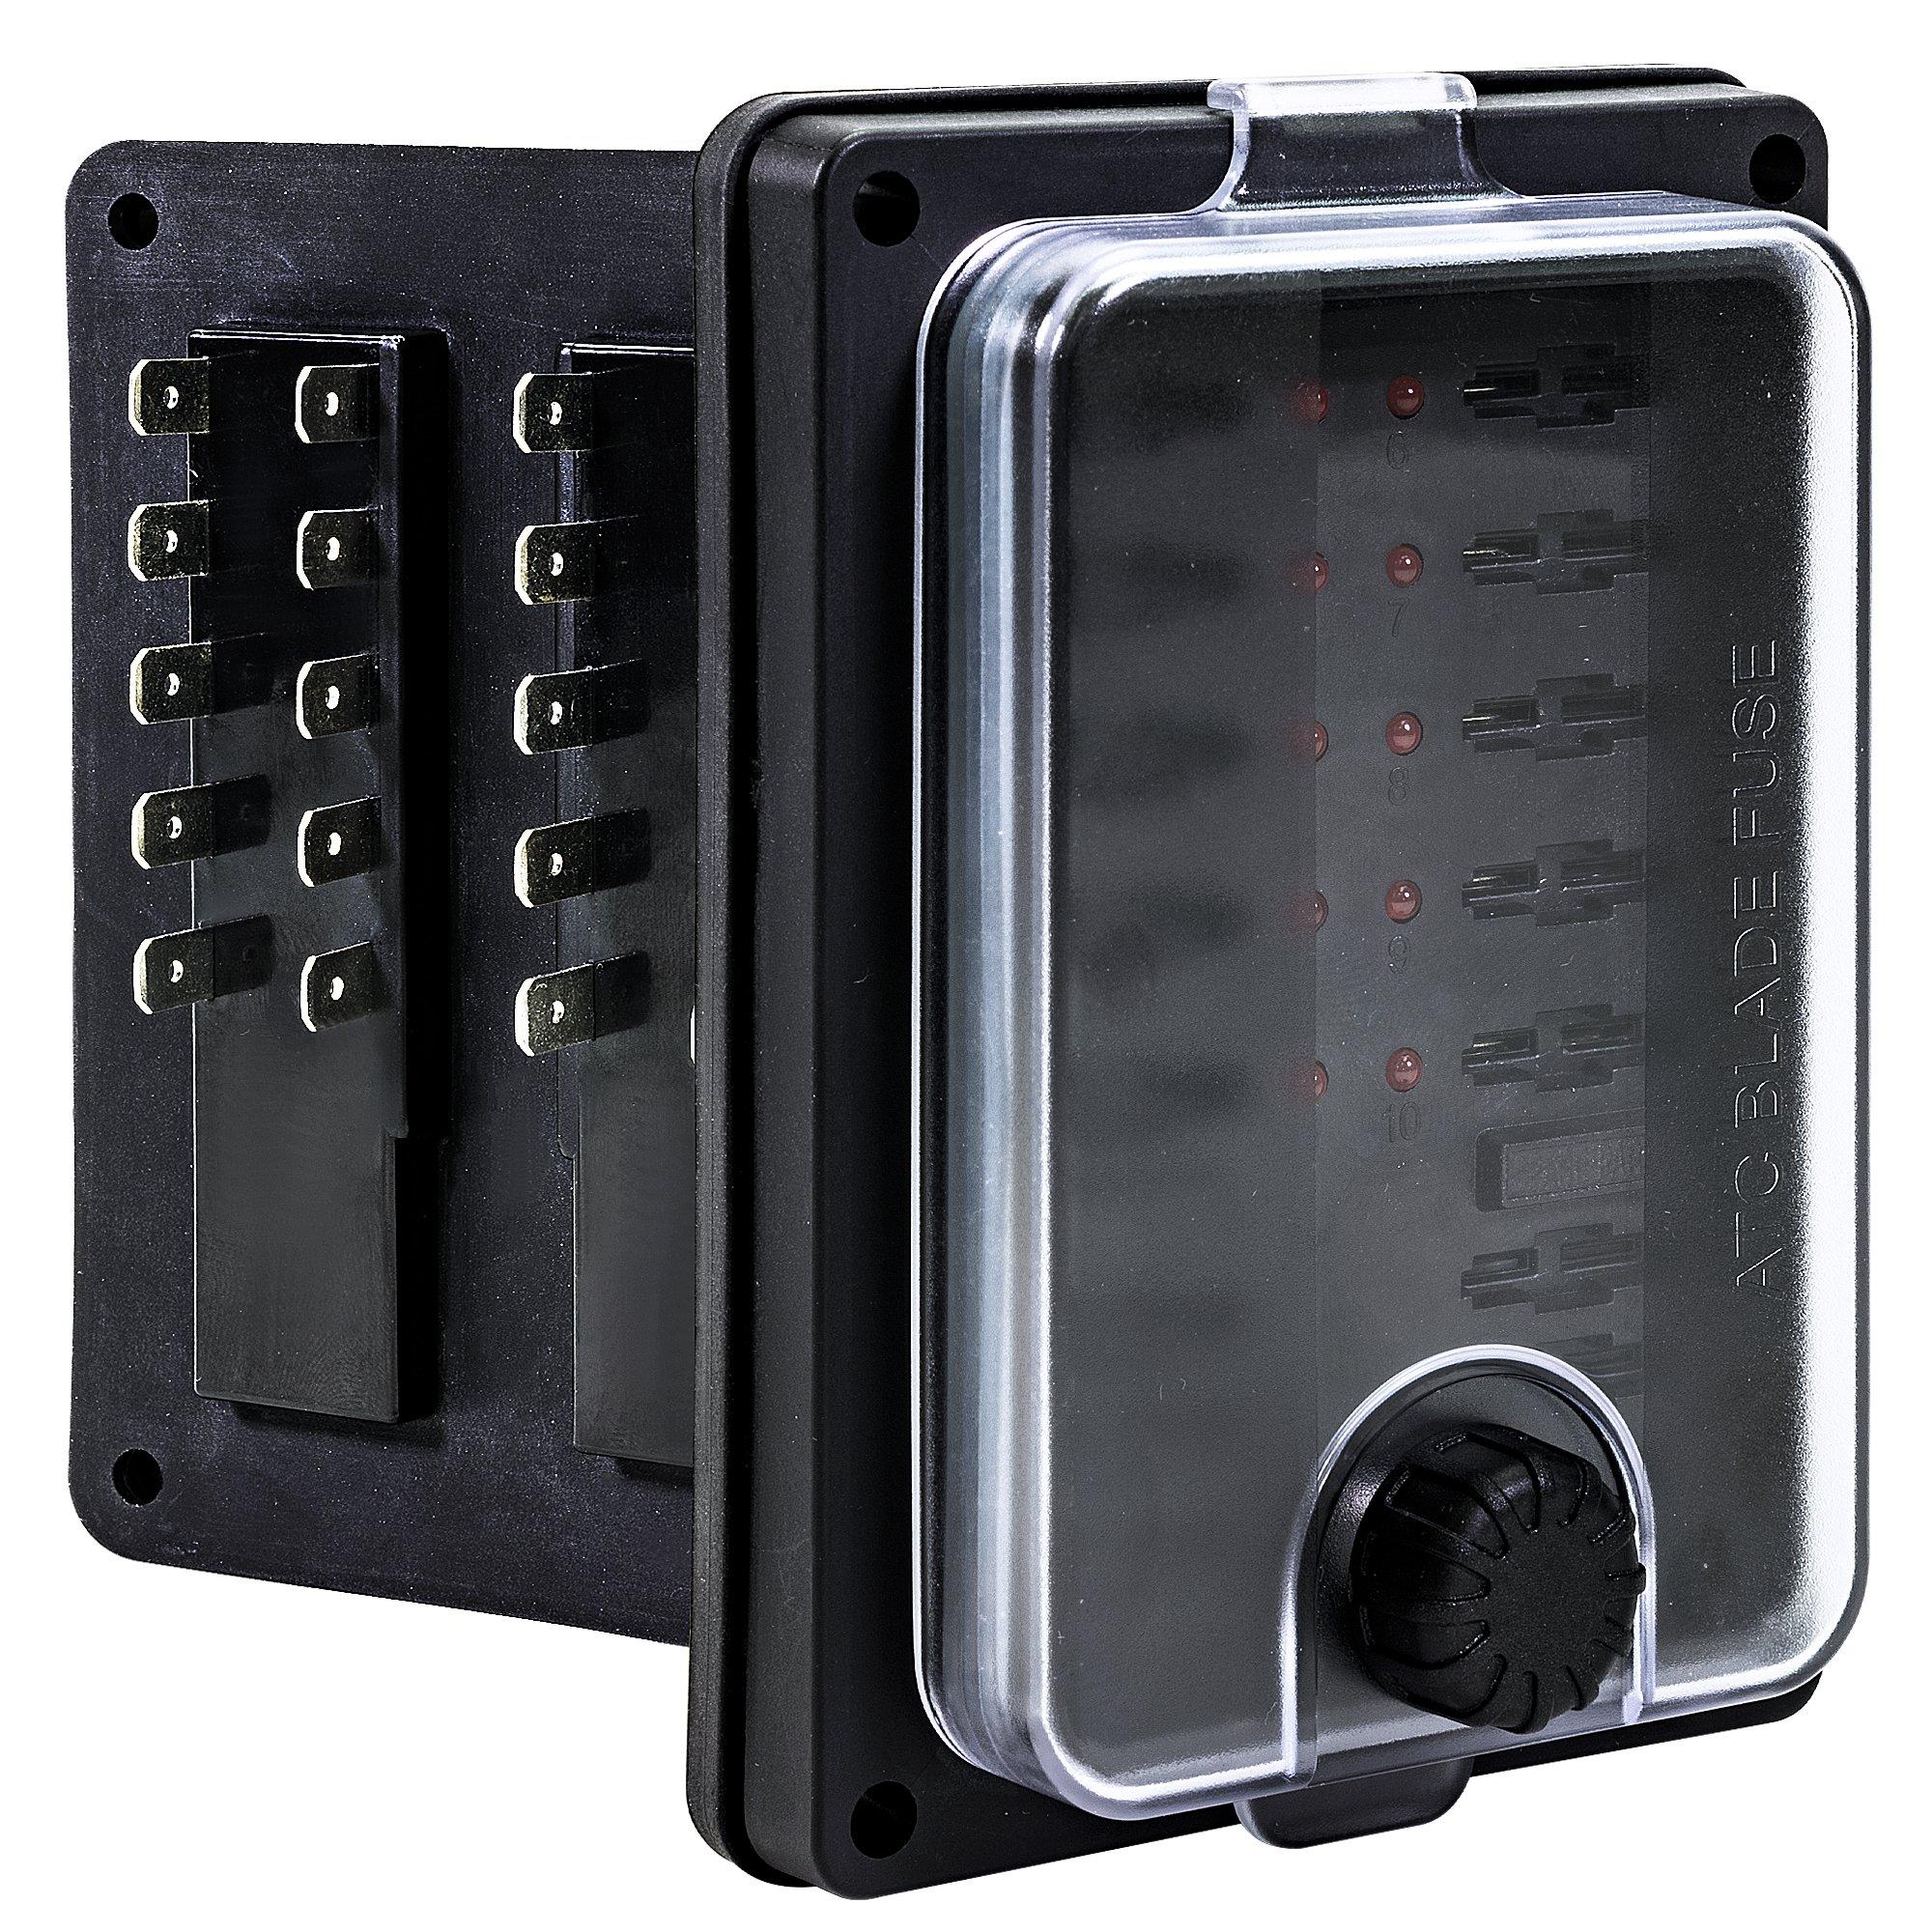 Amazon.com: 10 Way Waterproof Fuse Box for Automotive [ATC/ATO Blade Fuses]  [250 Amp] [Up to 25A per Socket] [LED Indicator] [12V - 32V DC] Auto Marine  Fuse Block: Automotive   Spare Fuses Box Enclosure      Amazon